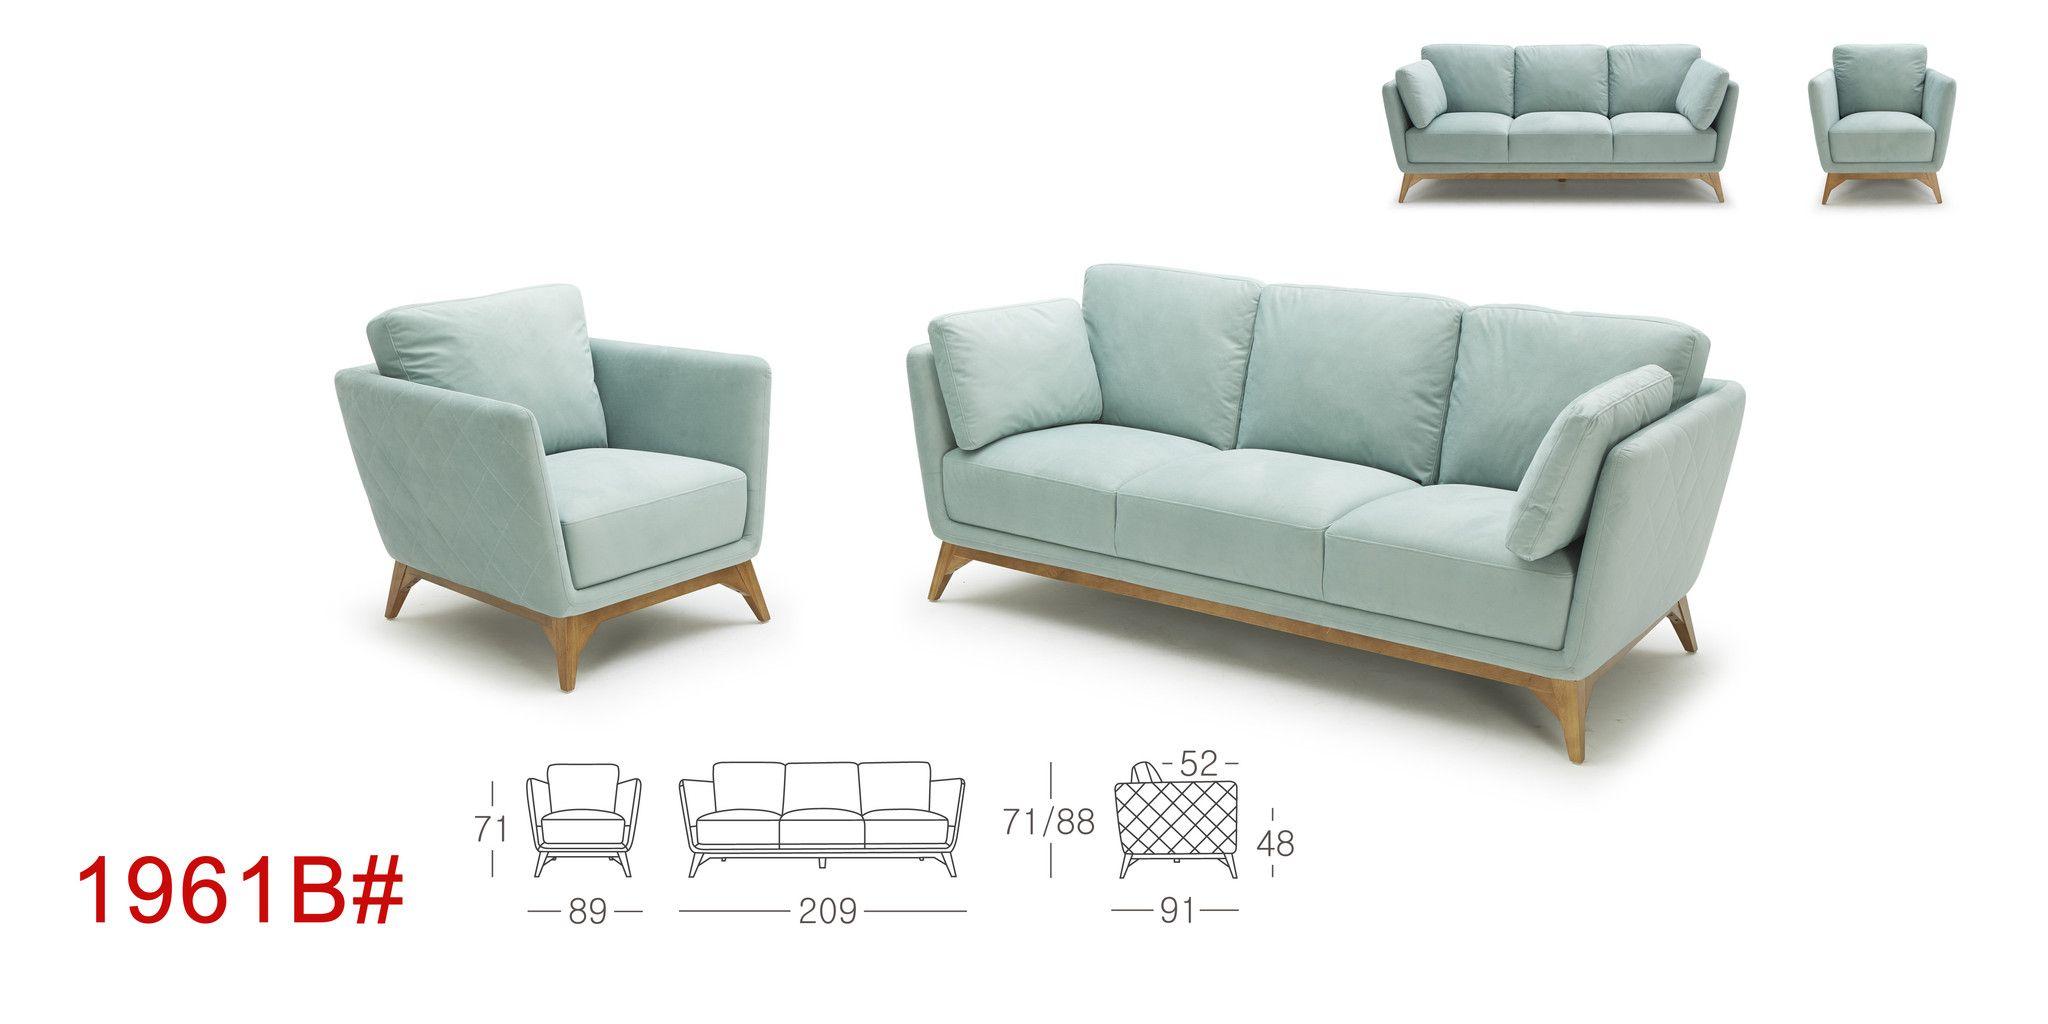 Kuka 1961b Fabric Sofa 1 Seater 2 Seater 3 Seater Ottoman Picket Rail Singapore S Premium Furniture Retailer 2 Sofa Decor Fabric Sofa Affordable Sofa